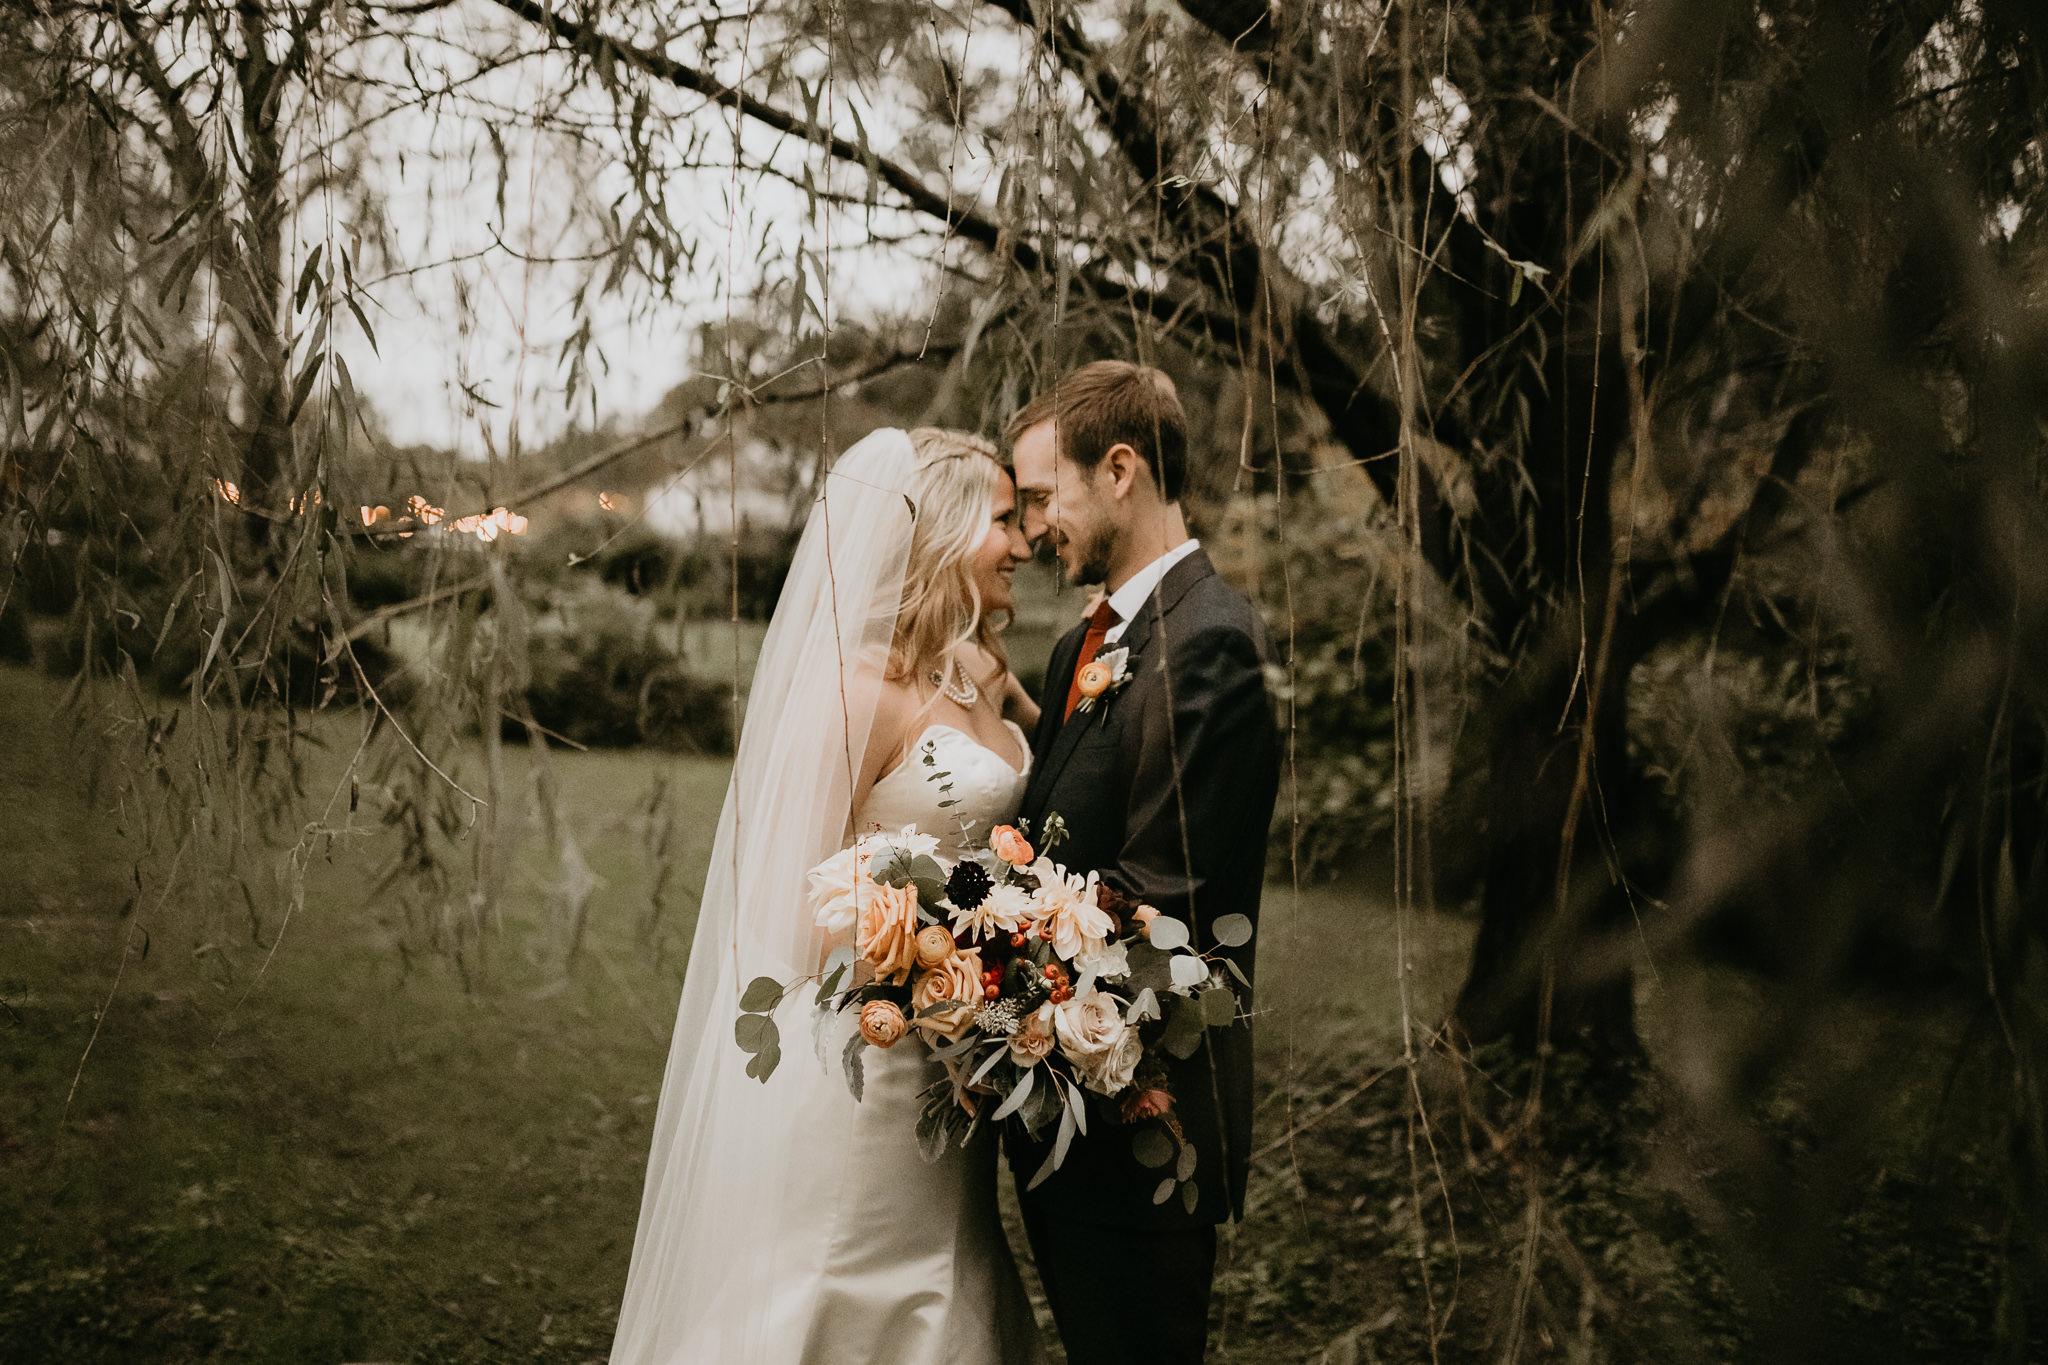 Sundara - Weddings - Virginia - Best Wedding Photographer - Pat Cori Photography-72.jpg